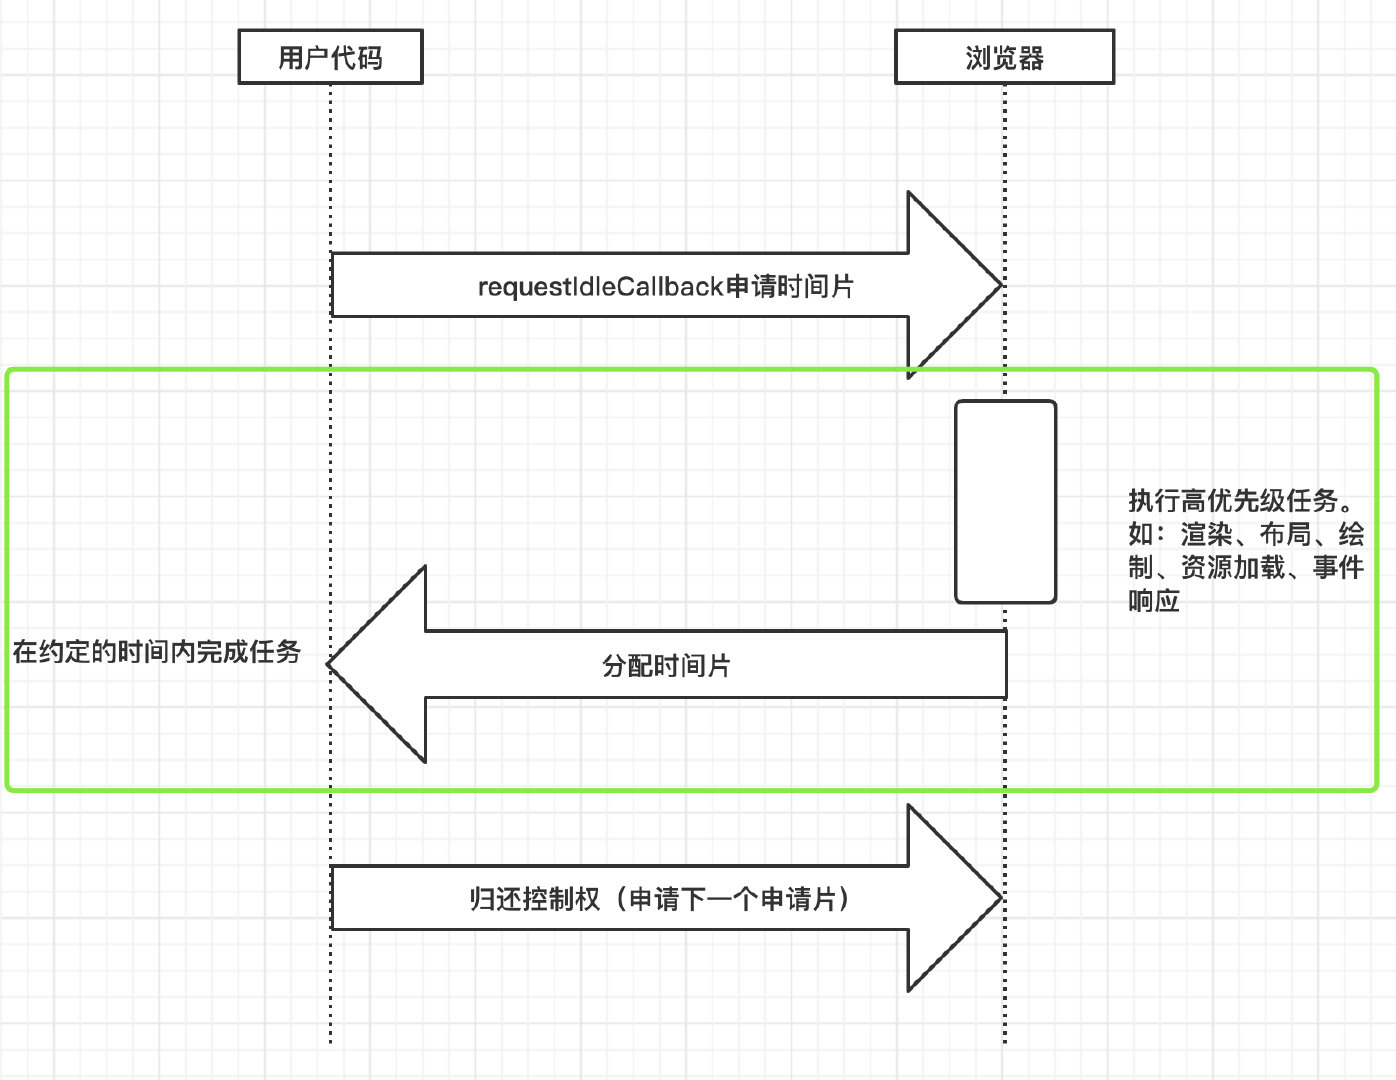 requestIdleCallback执行流程